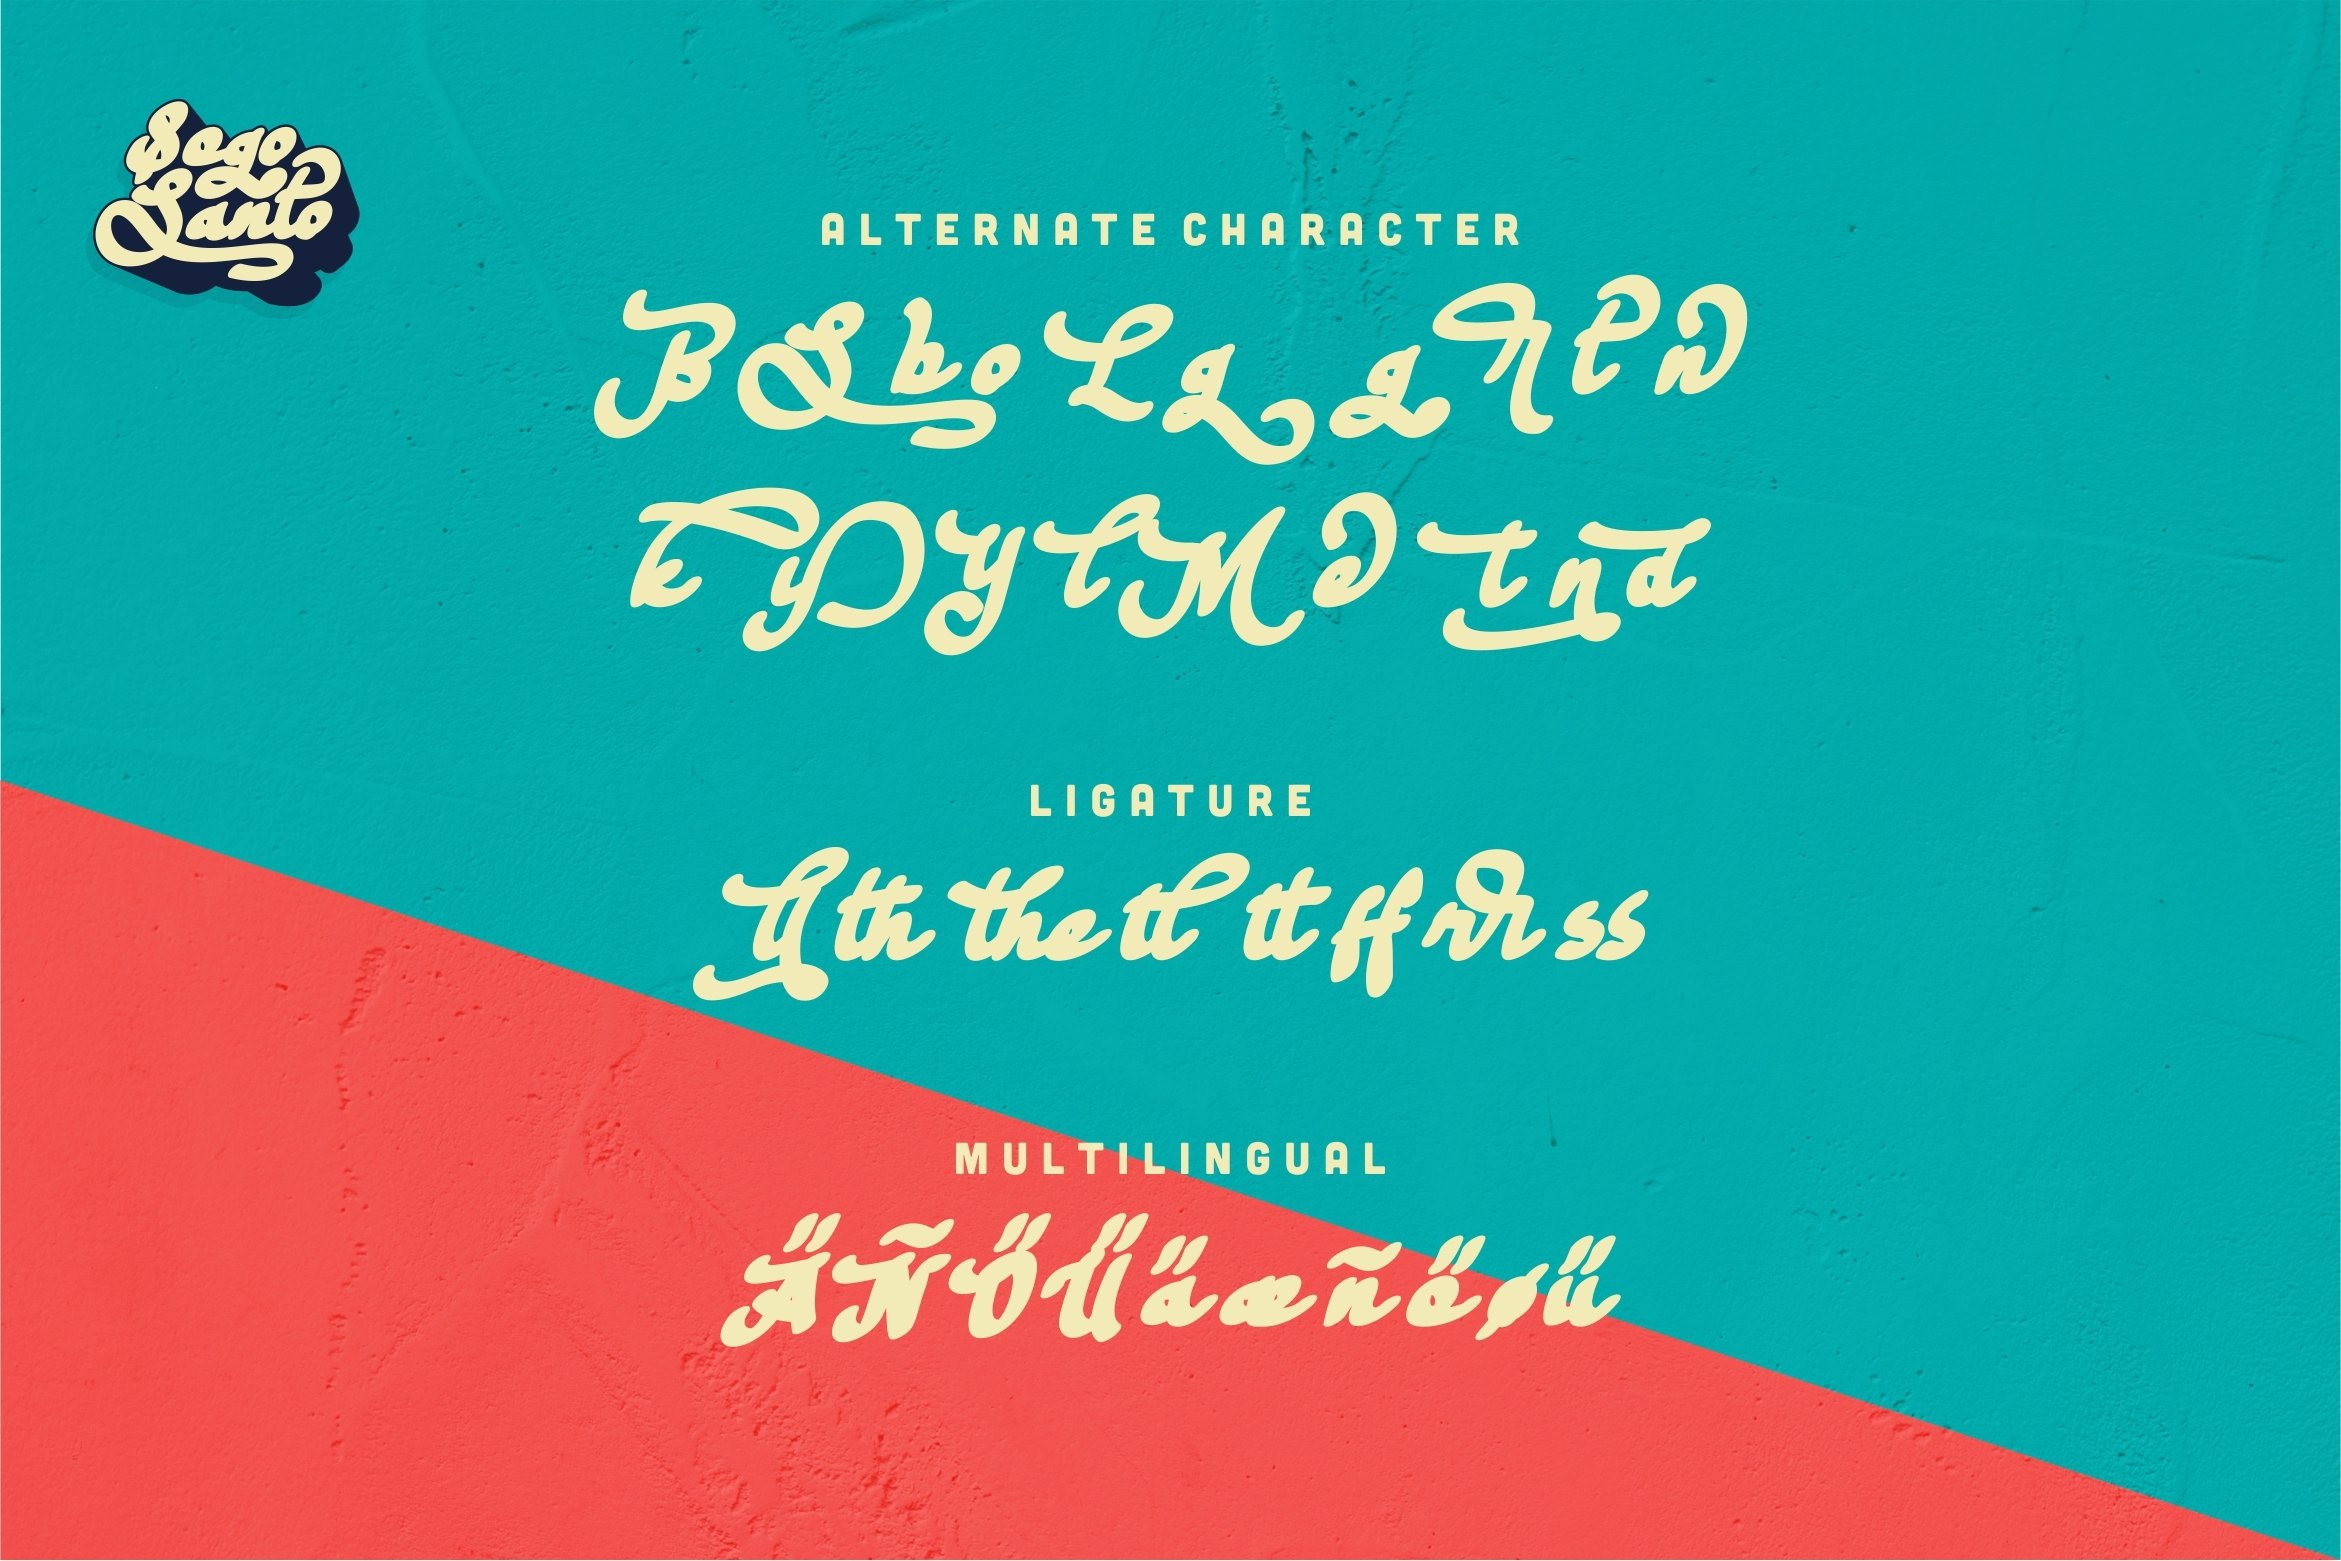 Sogo Santo - Bold & Smooth Retro Font example image 5